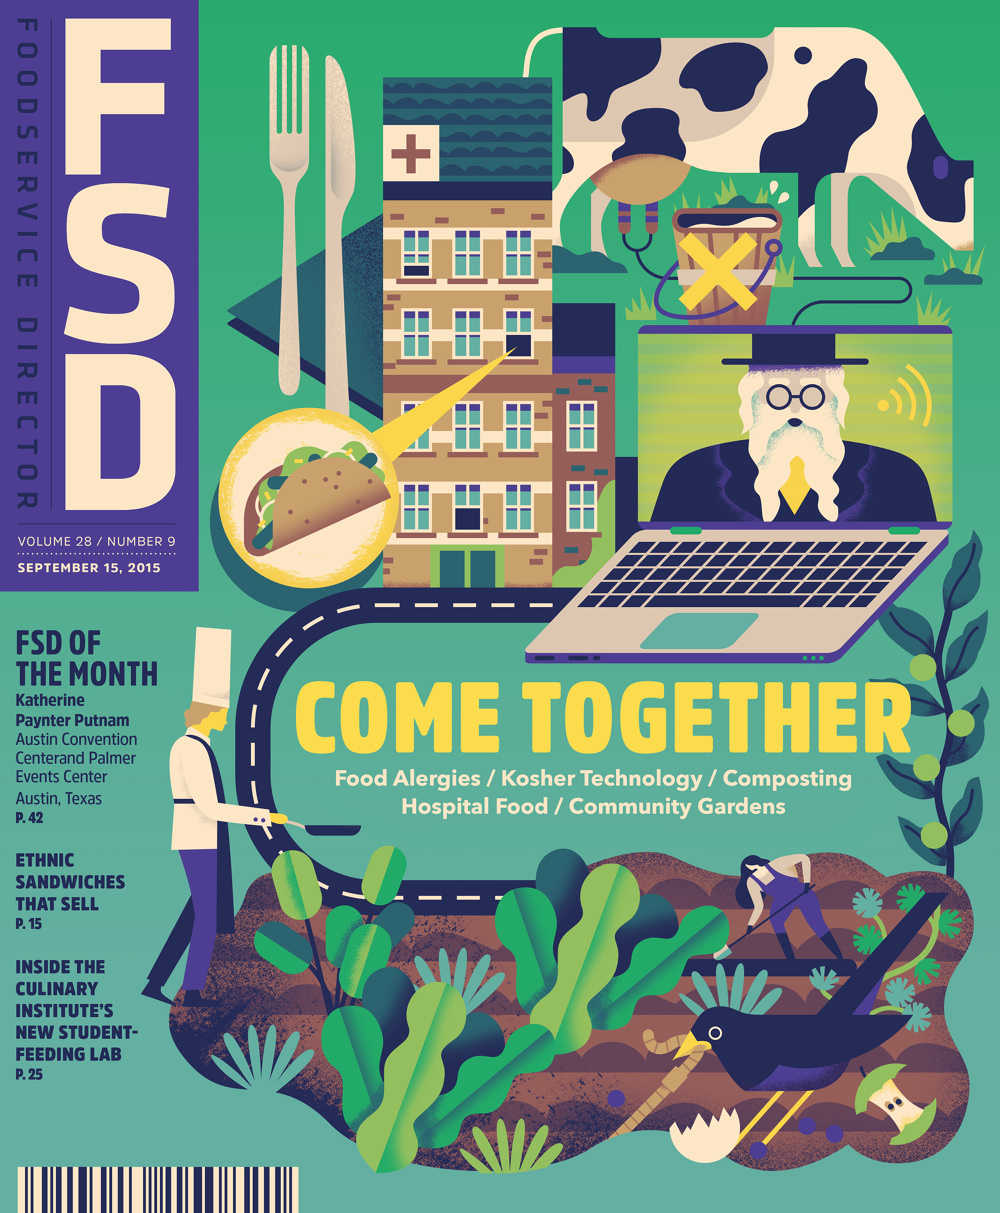 FSD - Owen Davey Illustration